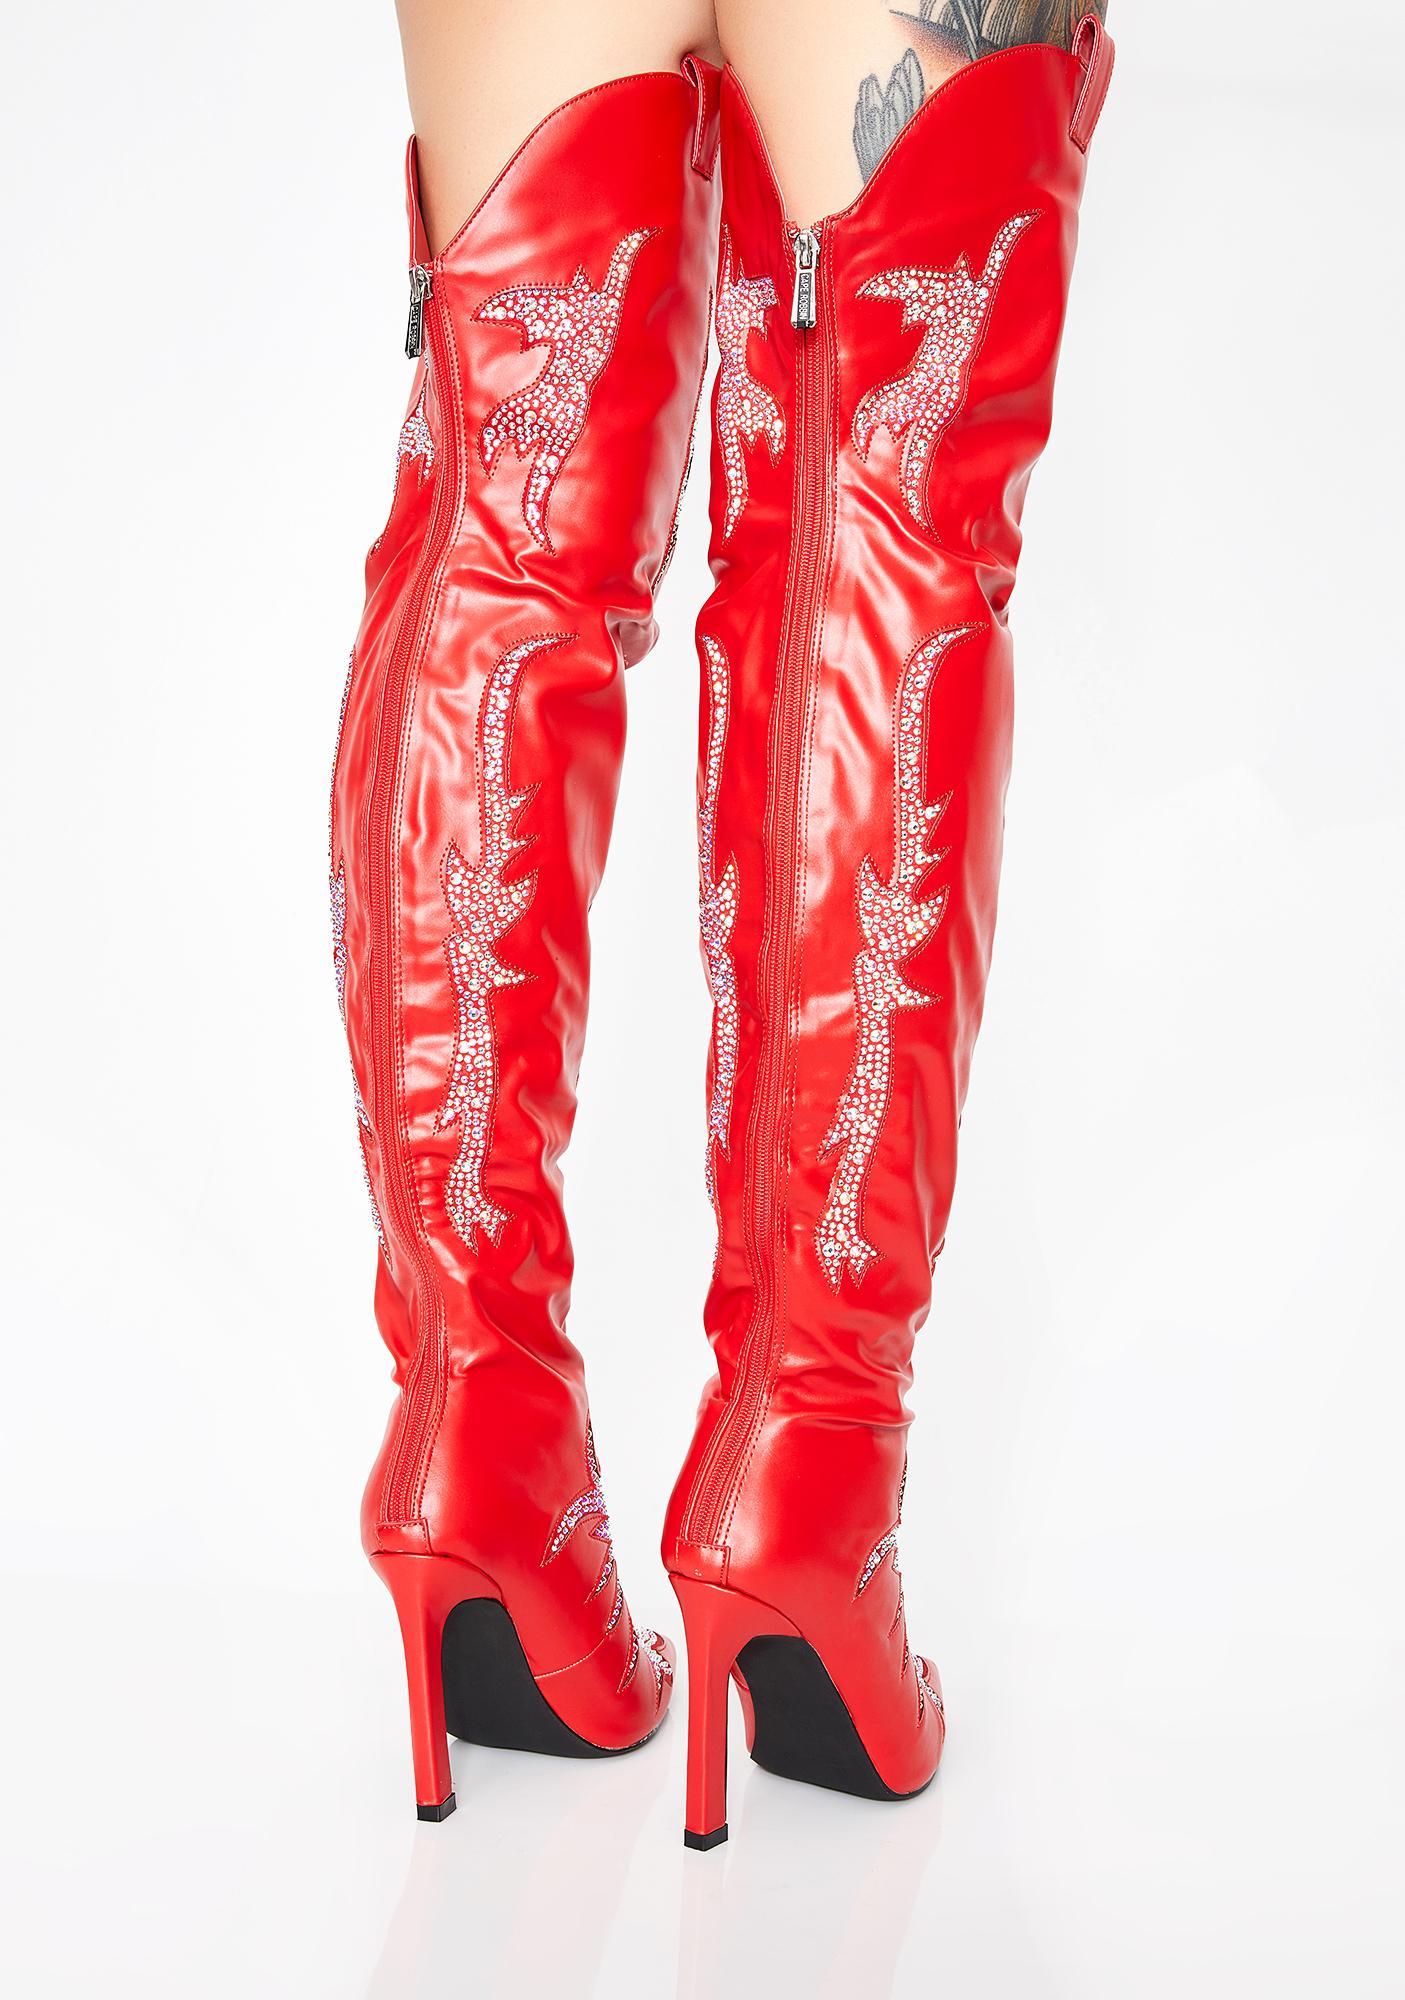 Lit Rhinestone Rider Thigh High Boots